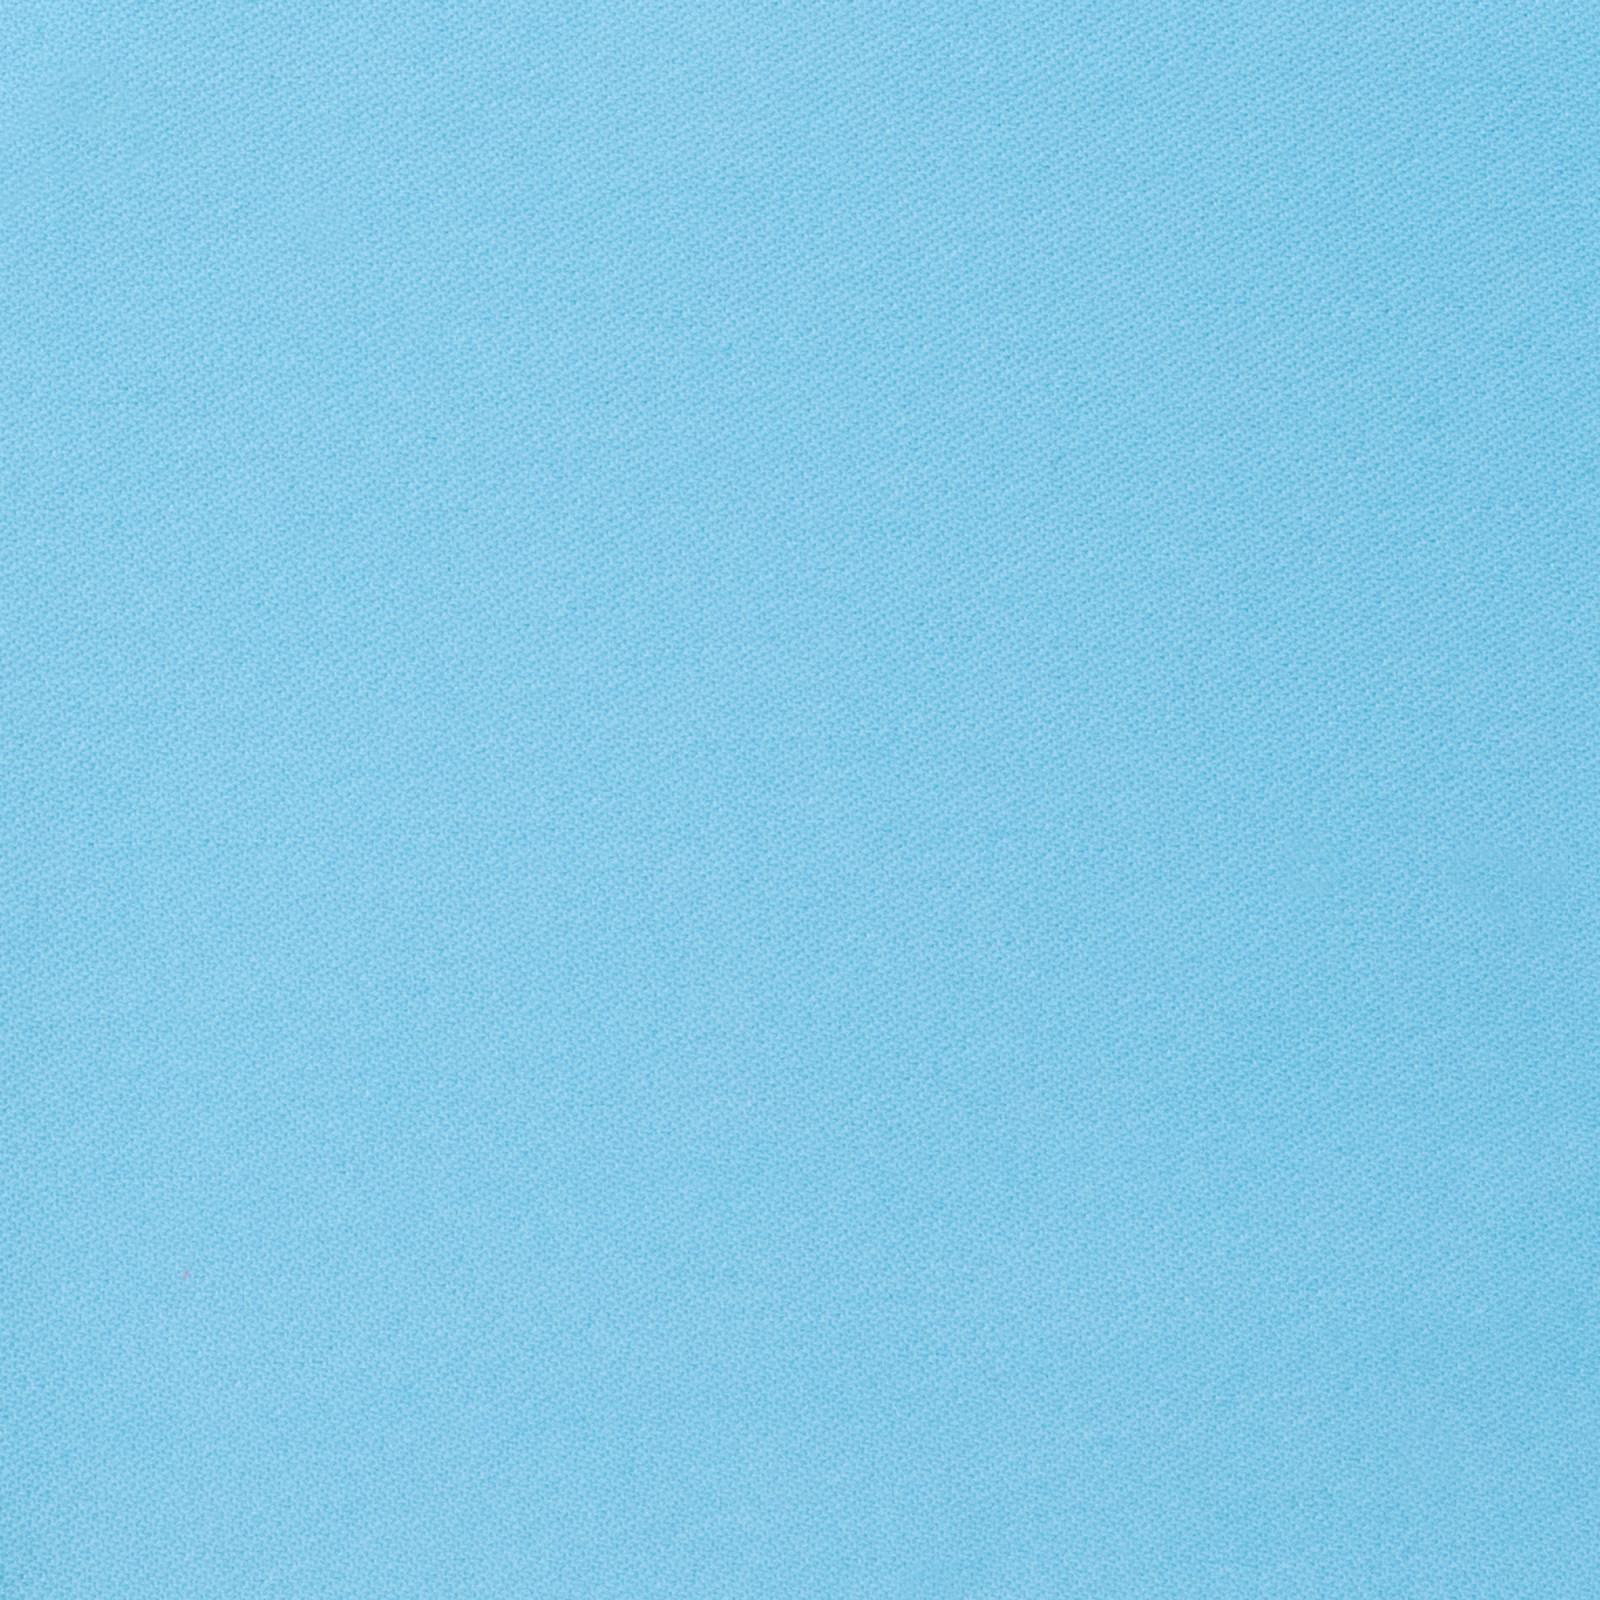 B8800 Carolina Blue  Greenhouse Fabrics